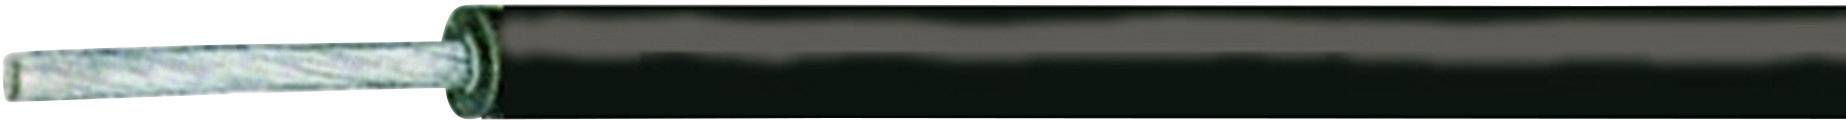 Stikalna žica SiL-SiAF 1 x 1 mm, modra XBK Kabel cena za meter